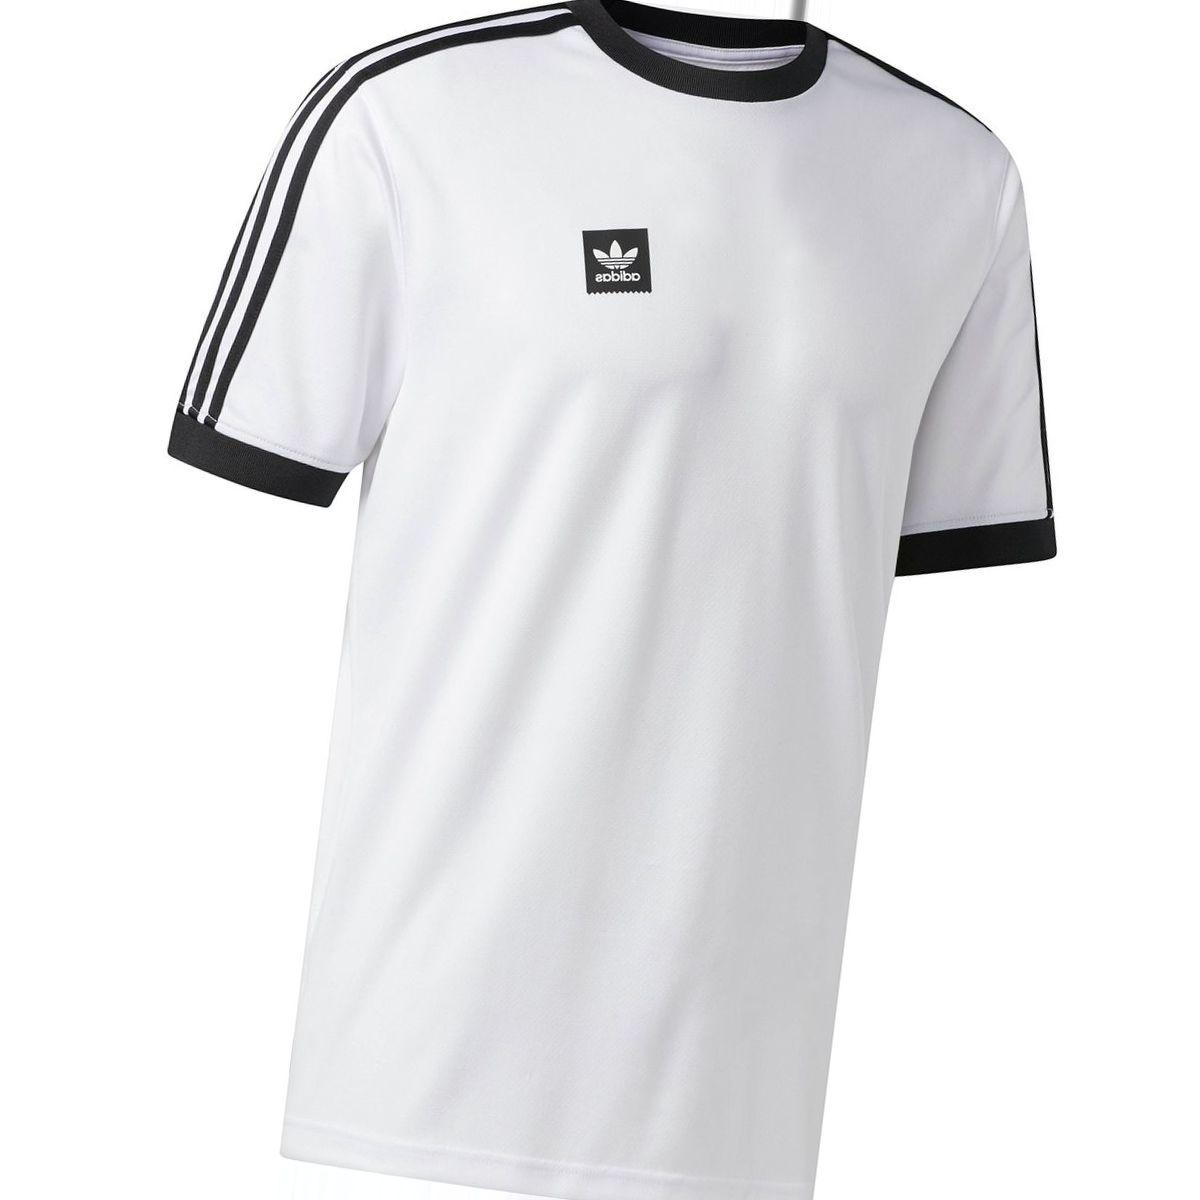 Adidas Club Jersey - Men's